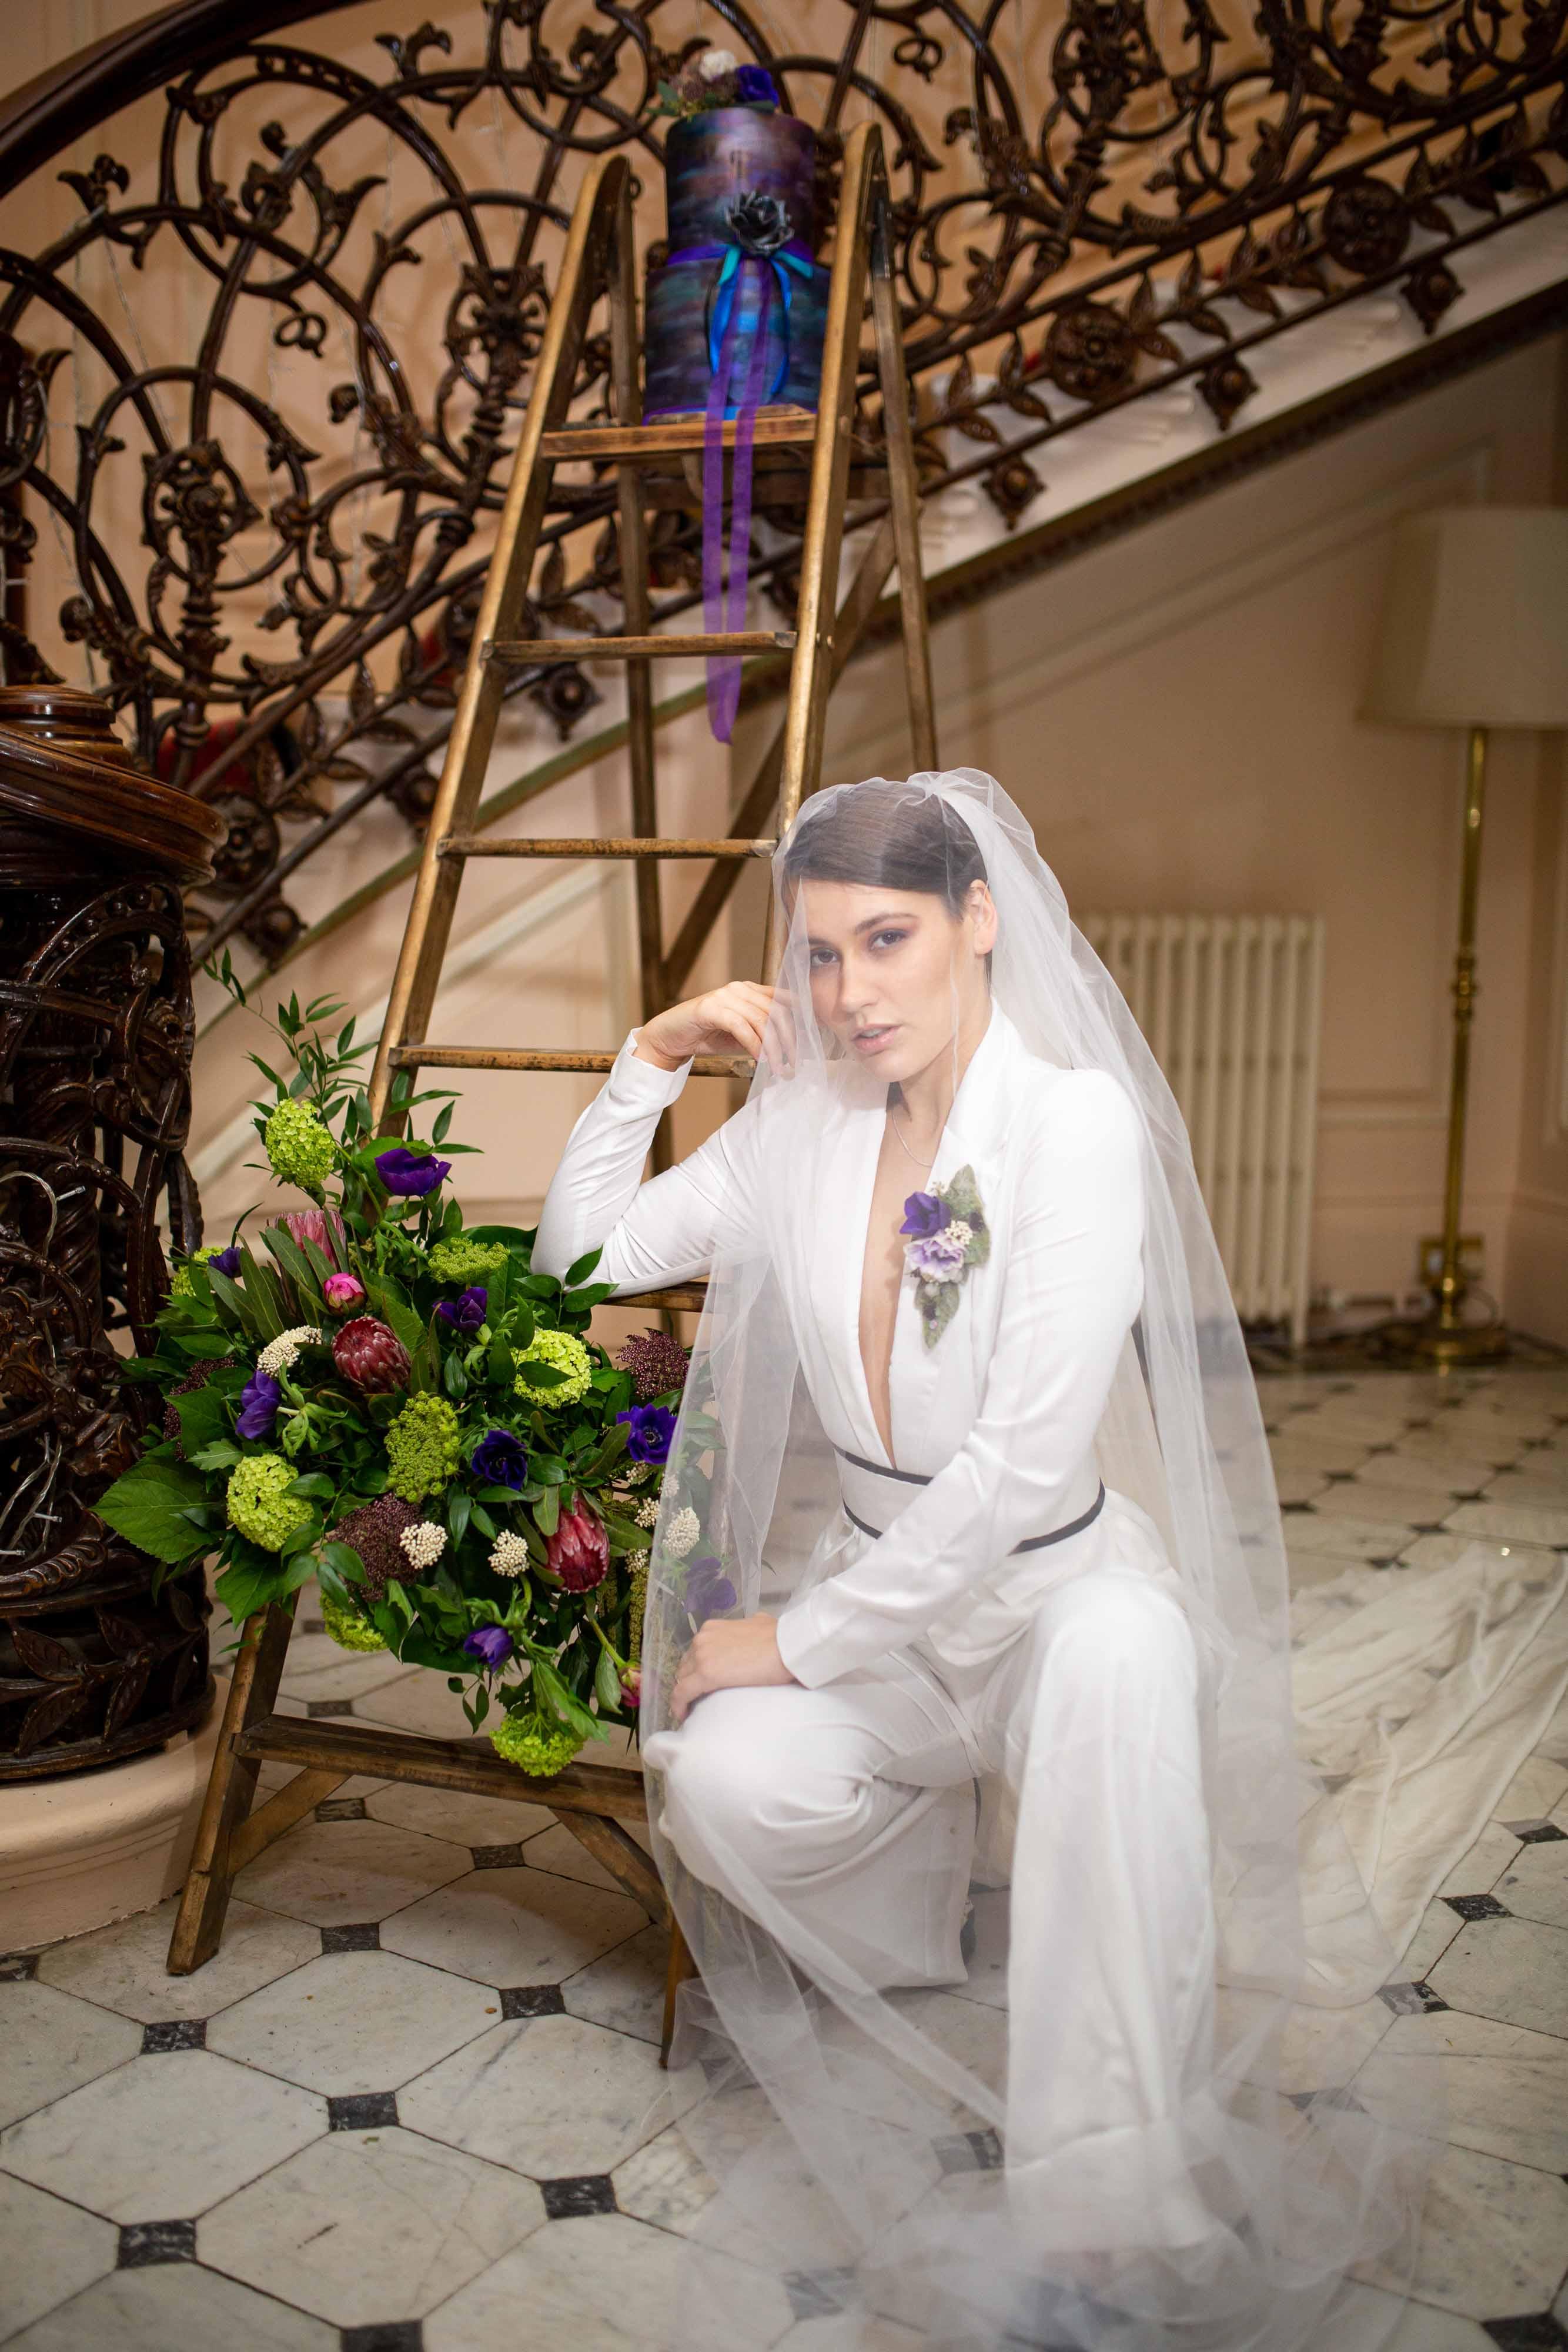 iconic wedding looks- music themed wedding- unconventional wedding- alternative wedding- annie lennox style- wedding suit- alternative wedding look- womens wedding suit- wedding jumpsuit